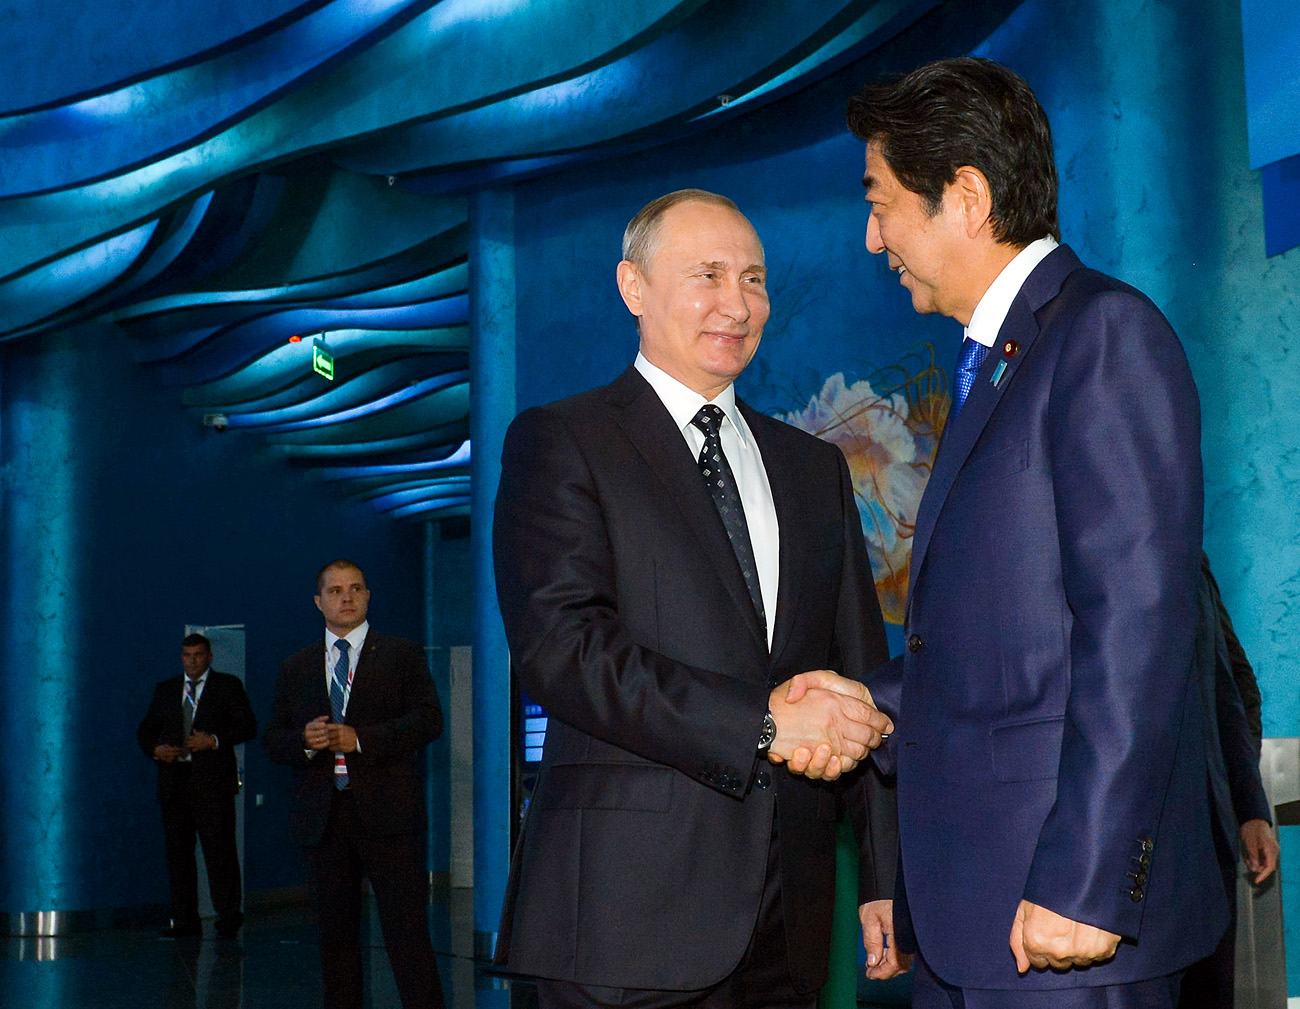 Pútin (esq.) com o premiê japonês,  Shinzo Abe (dir.).